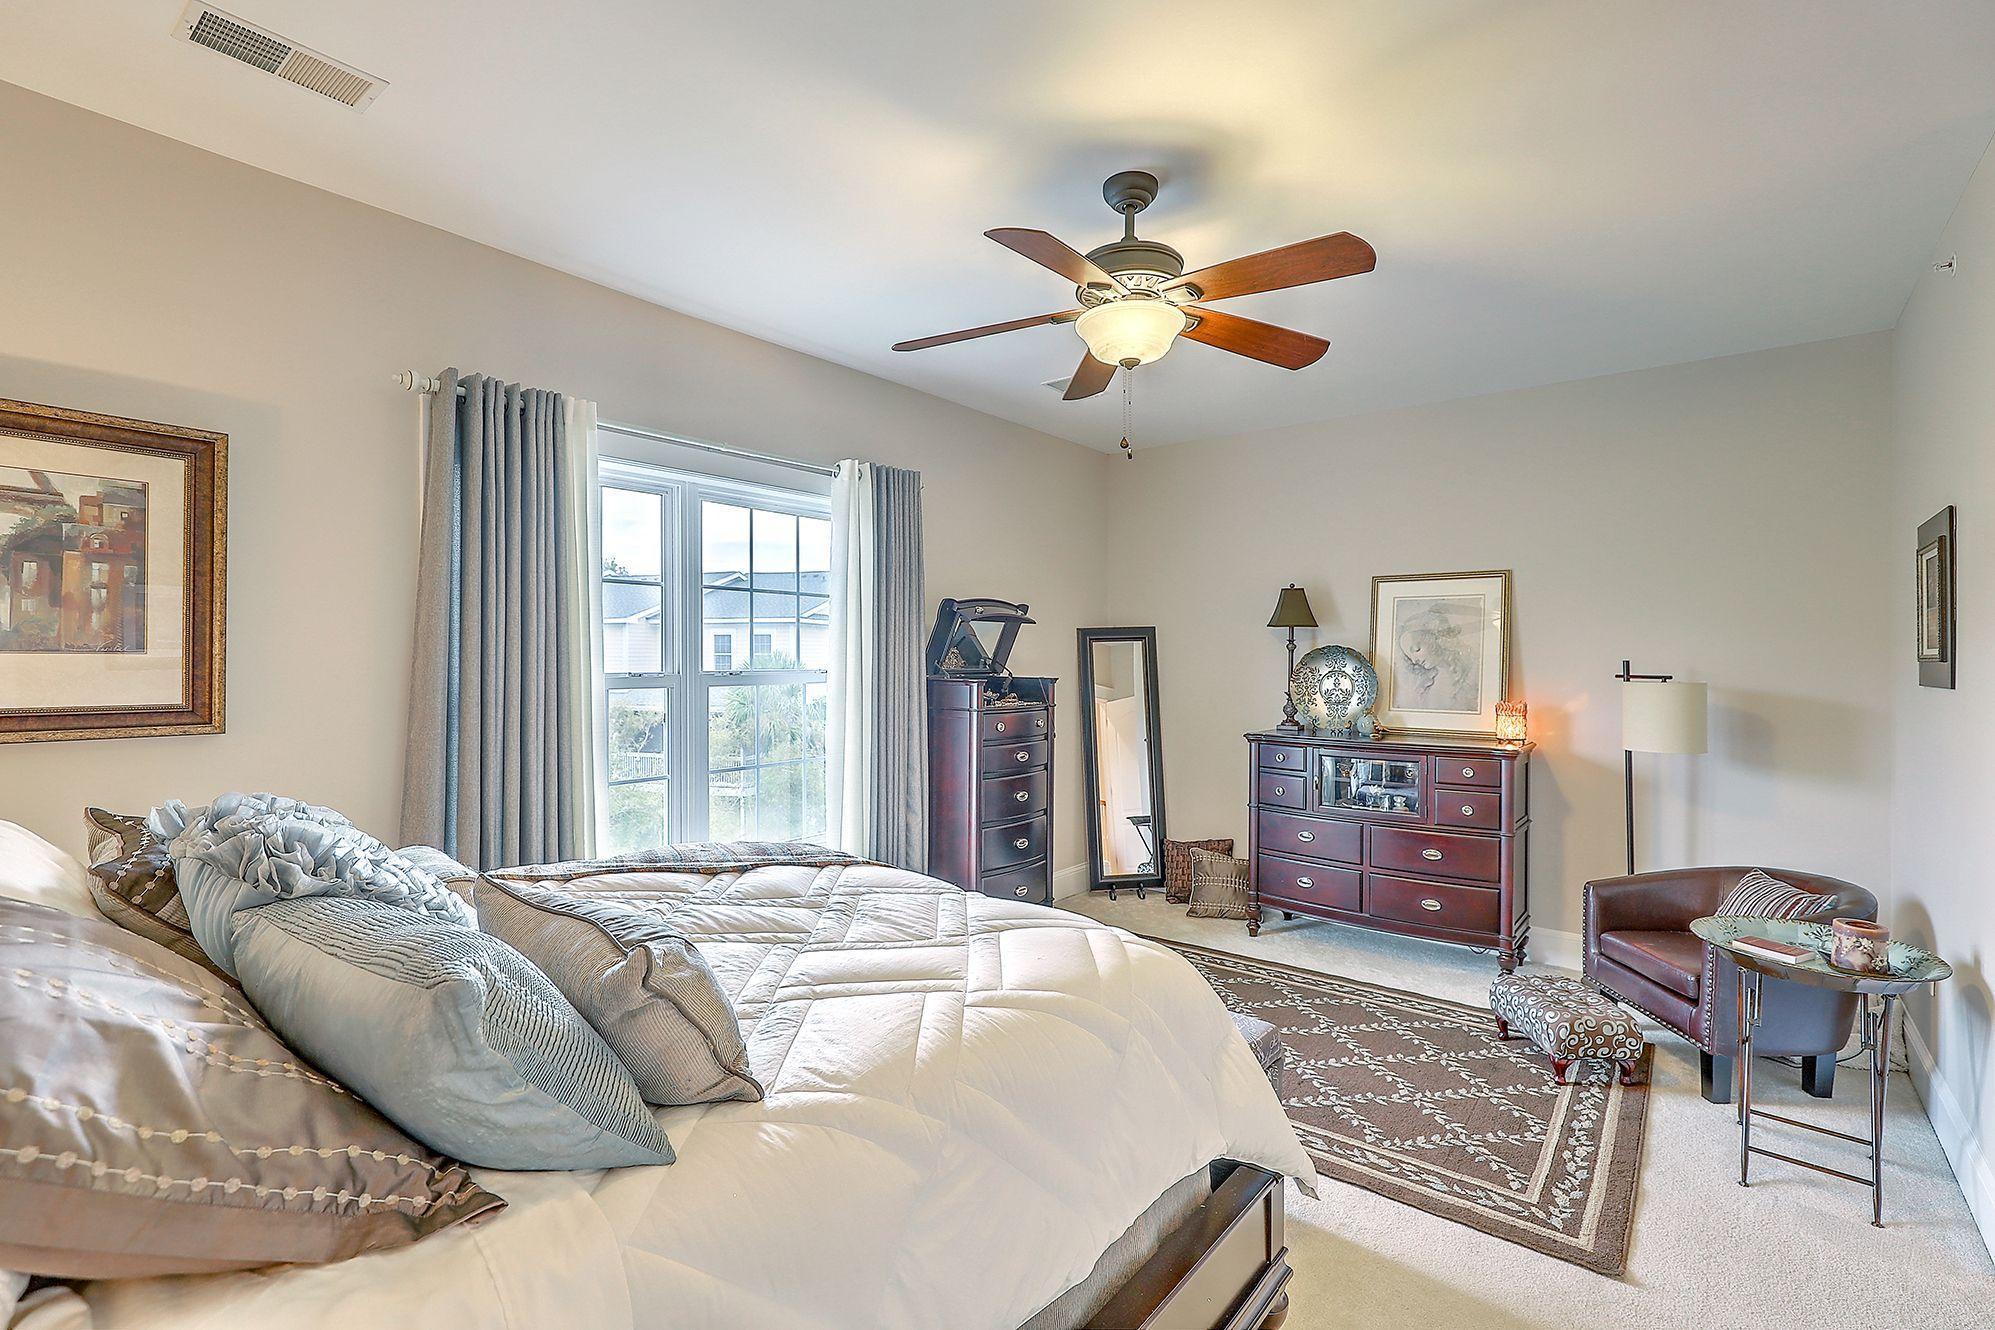 Etiwan Pointe Homes For Sale - 208 Etiwan Pointe, Mount Pleasant, SC - 18